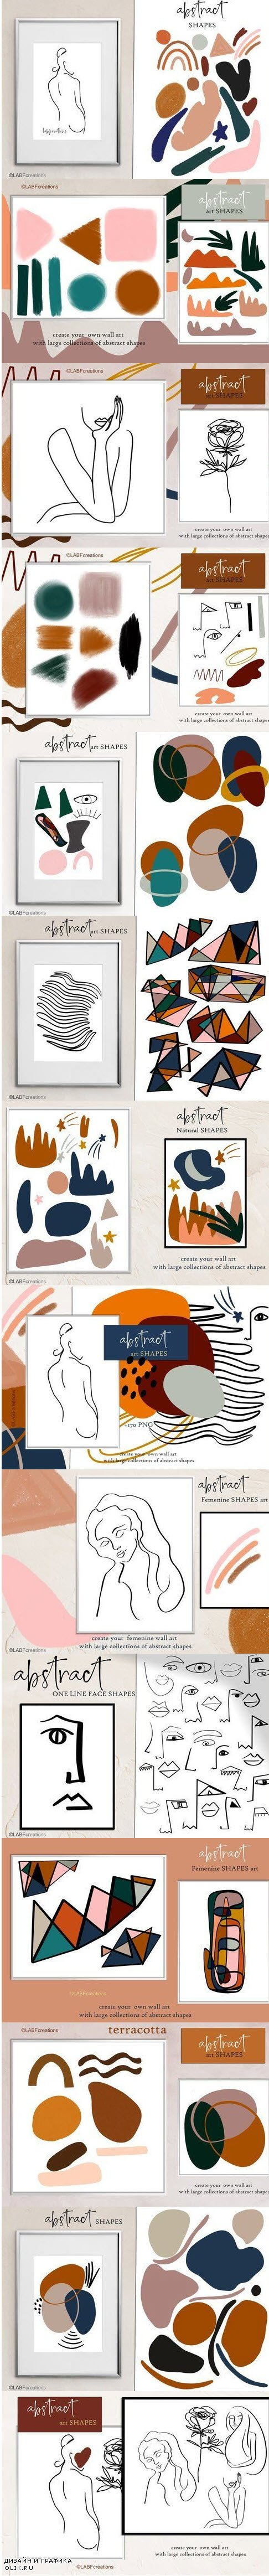 Abstract shape art clipart - 4260318